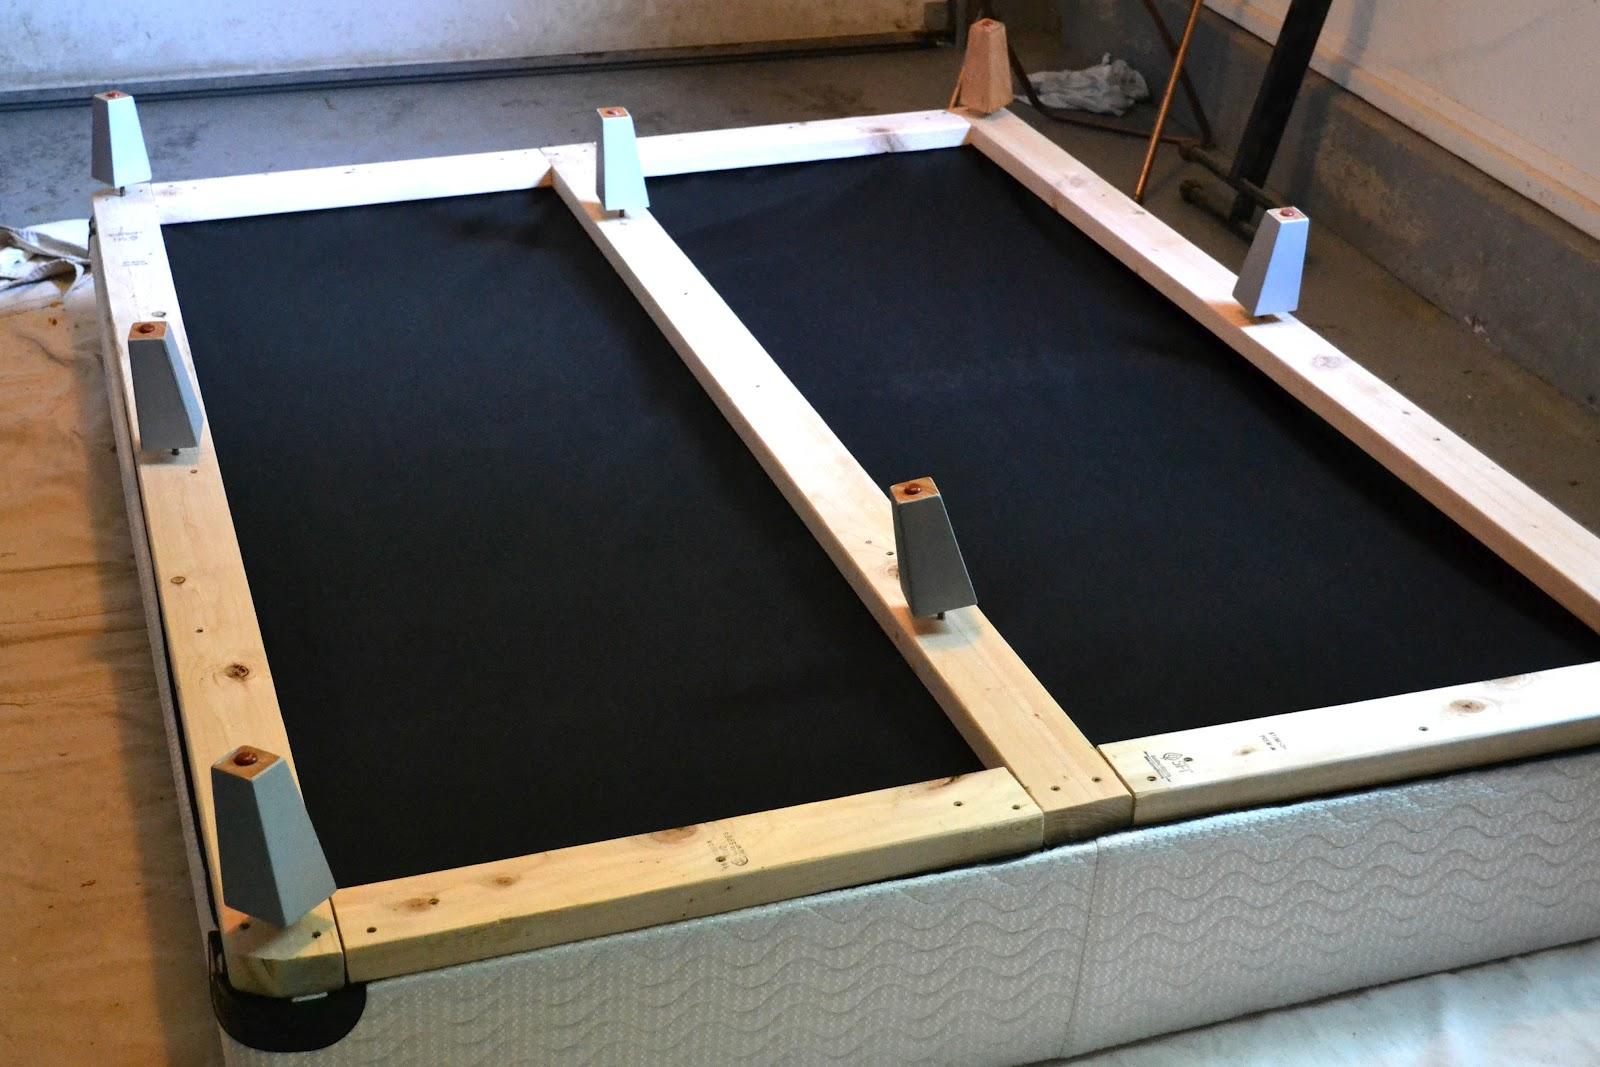 heidi schatze lego vaughn upholstered box spring. Black Bedroom Furniture Sets. Home Design Ideas